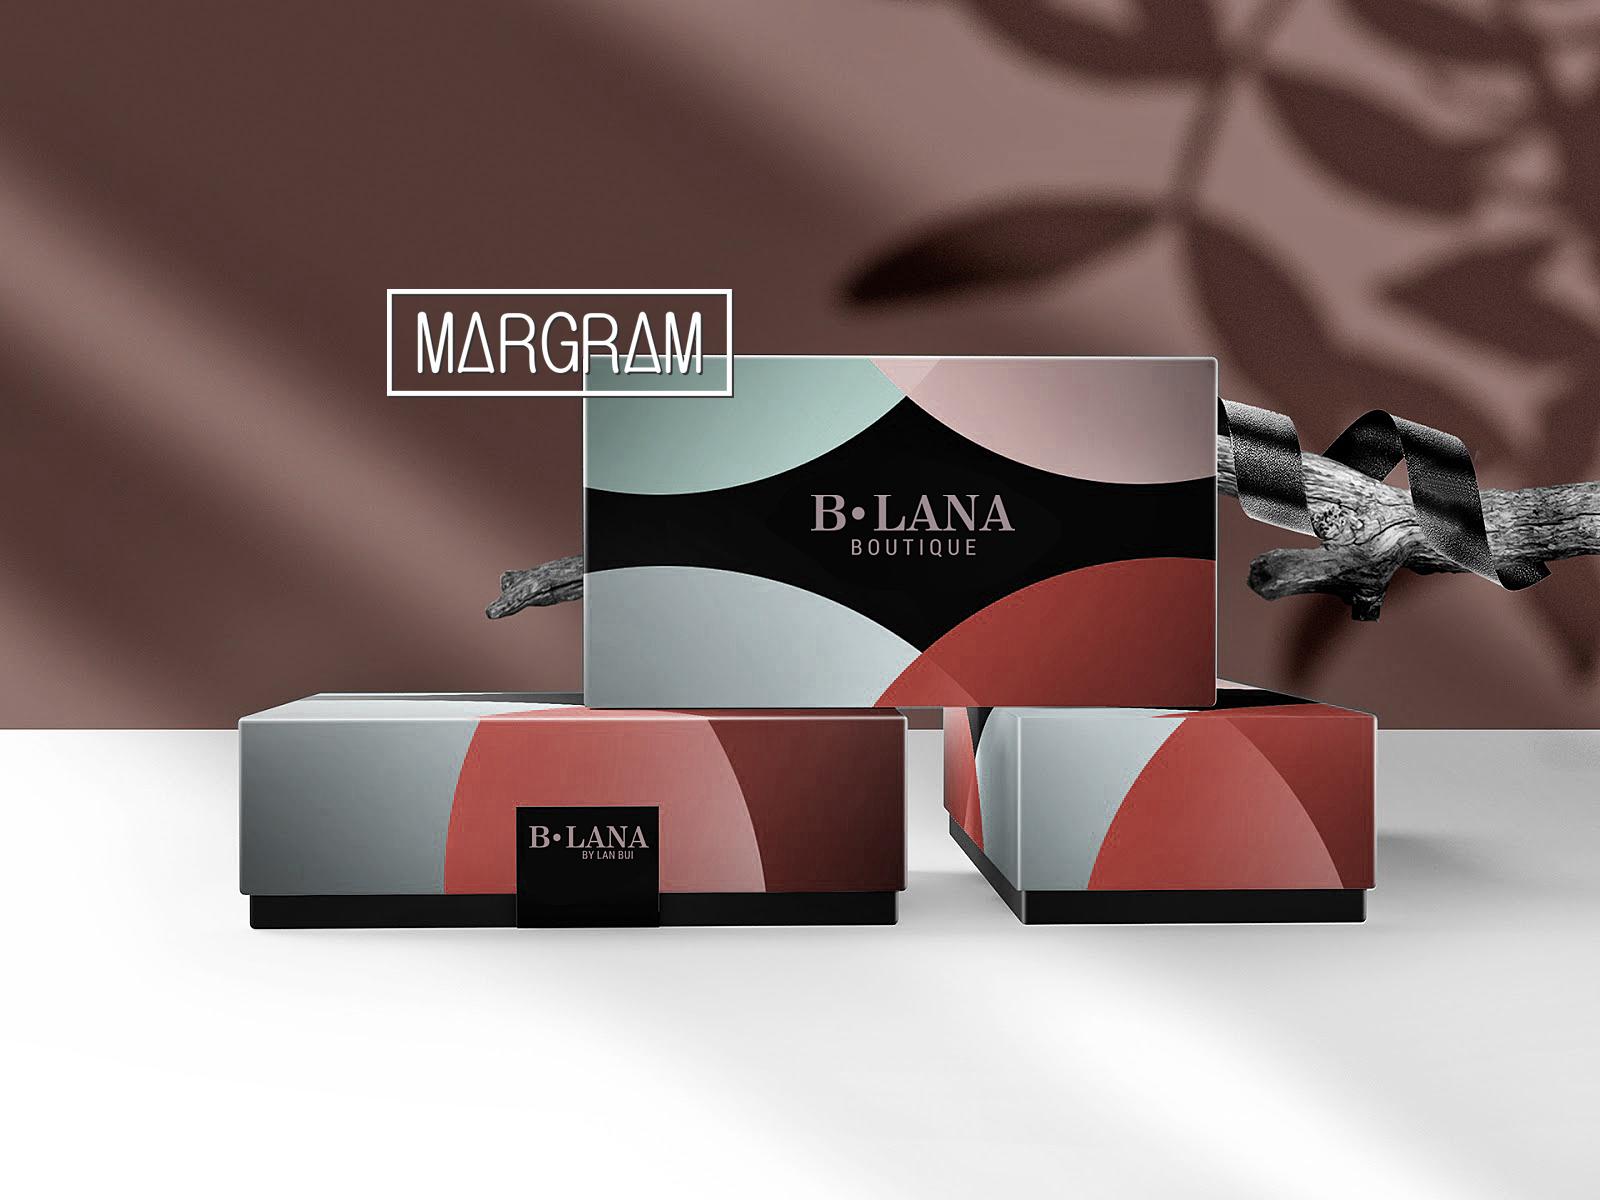 nhan-dien-nhan-hieu-b.lana-boutique-margram-02